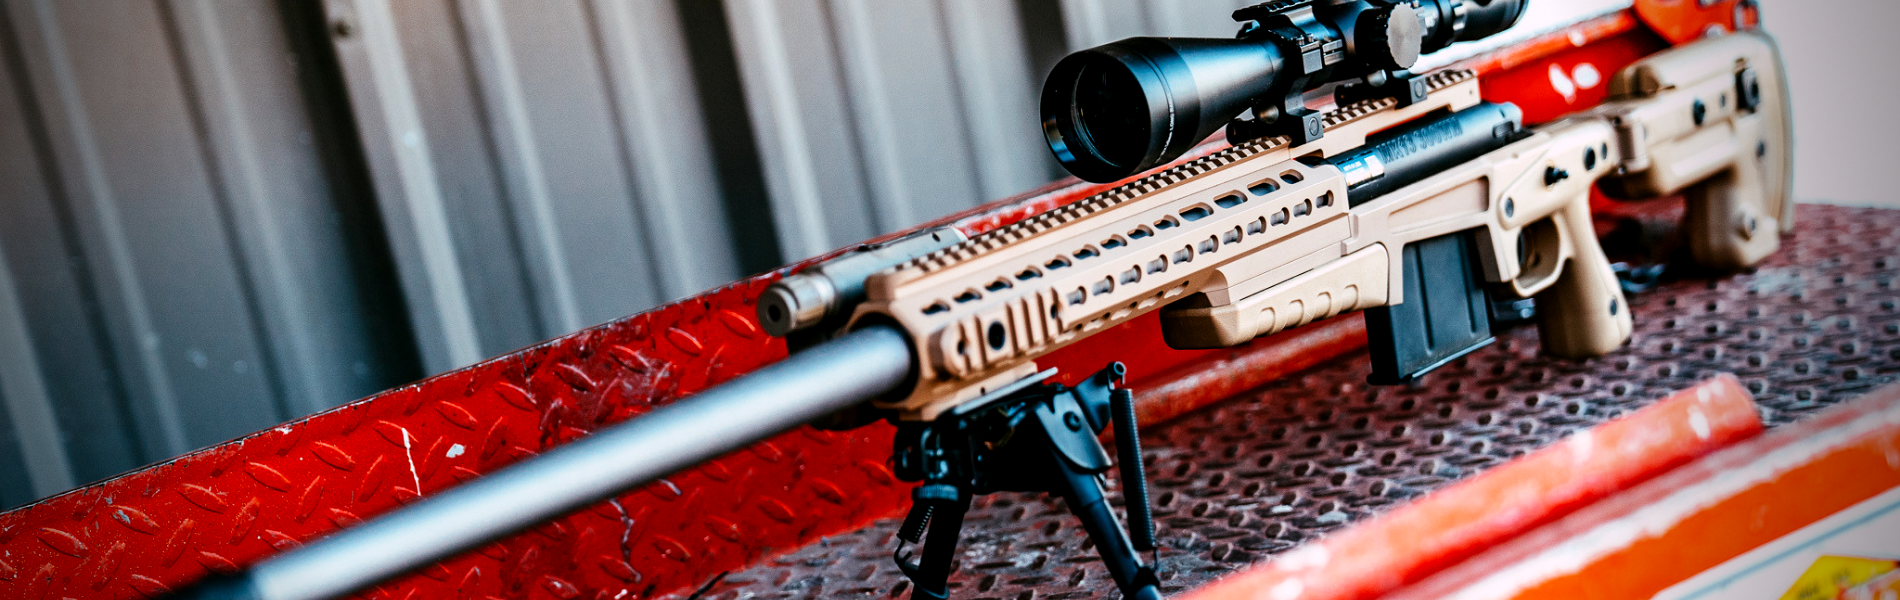 free-gun-giveaway-3-31-21.png